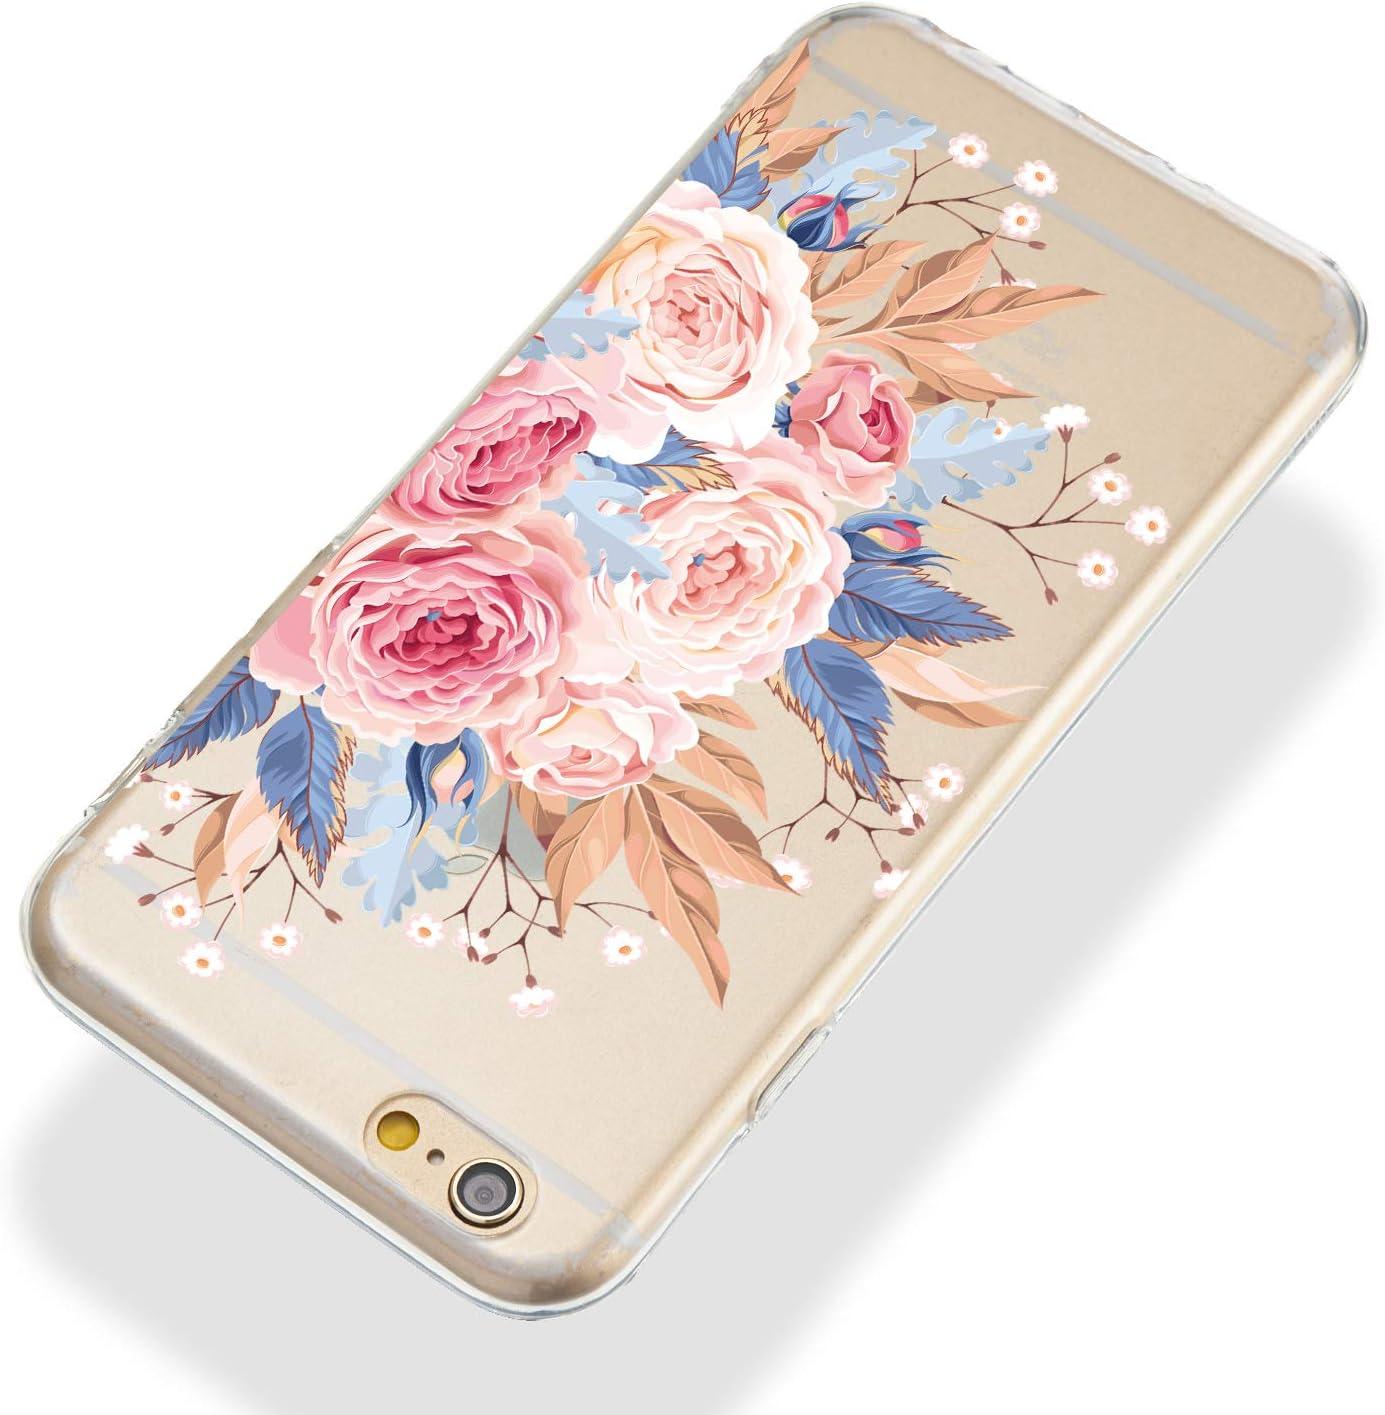 iPhone 6S Handyh/ülle Pink Sto/ßstange Anti-Scratch Silikon Case iPhone 6 iPhone 6S h/ülle Silikon Transparent d/ünn Huphant kompatibel mit iPhone 6 Anti-Gelb